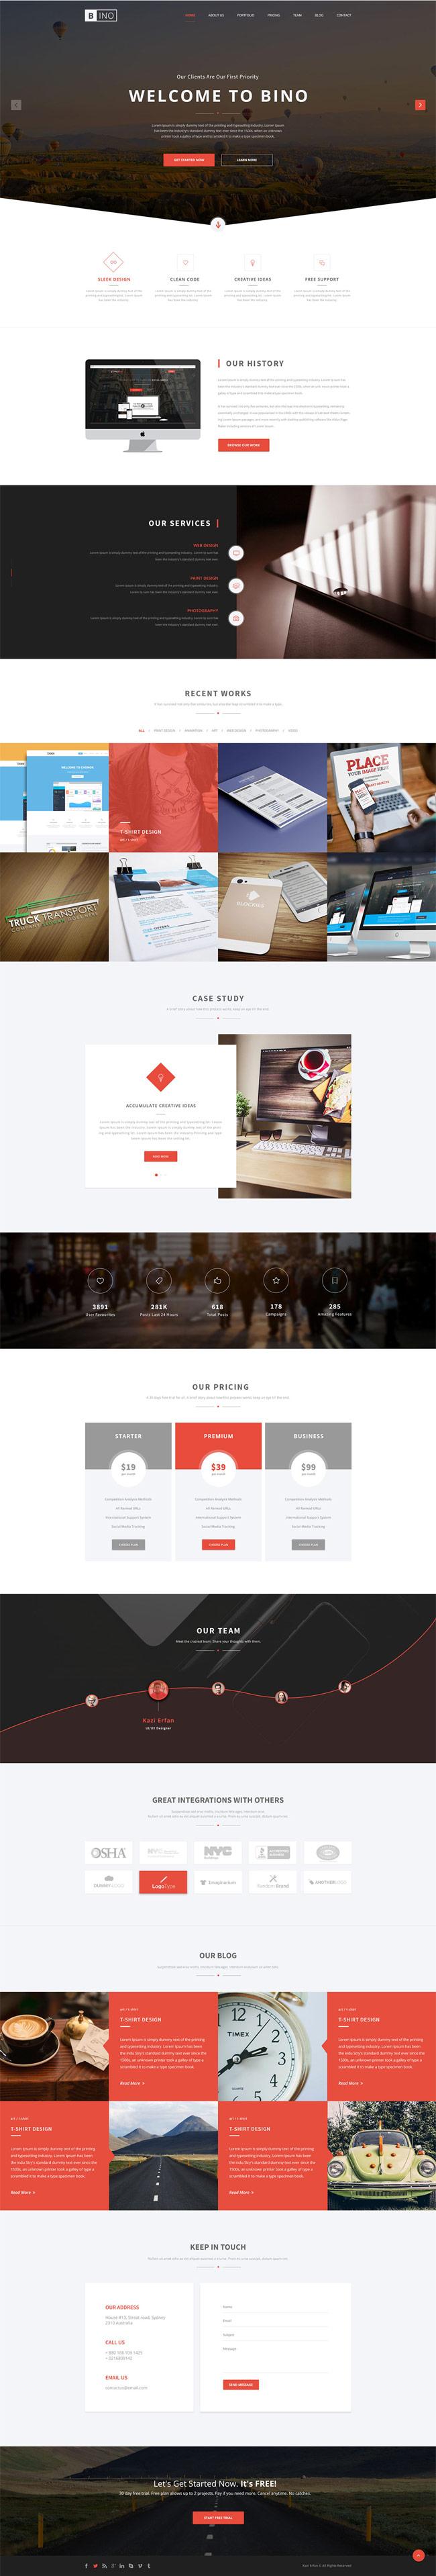 Bino-Free-Landing-Page-PSD-Template